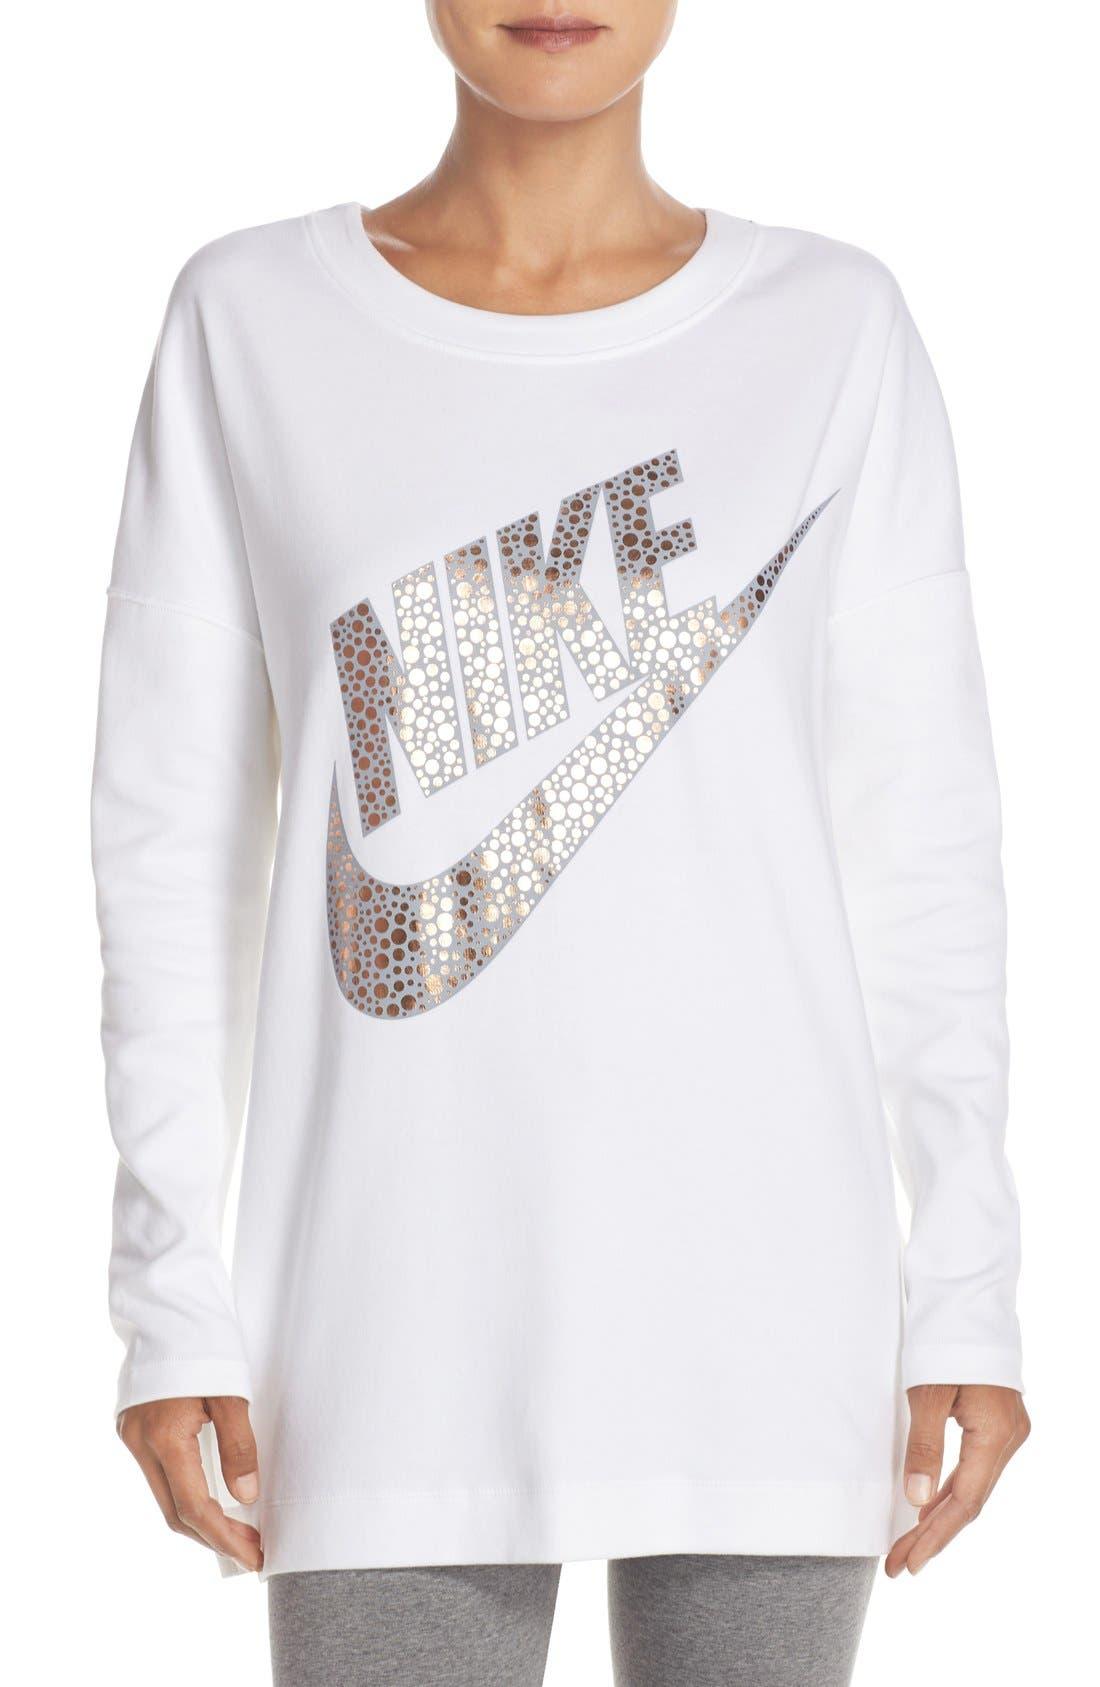 Alternate Image 1 Selected - Nike Logo Graphic Sweatshirt